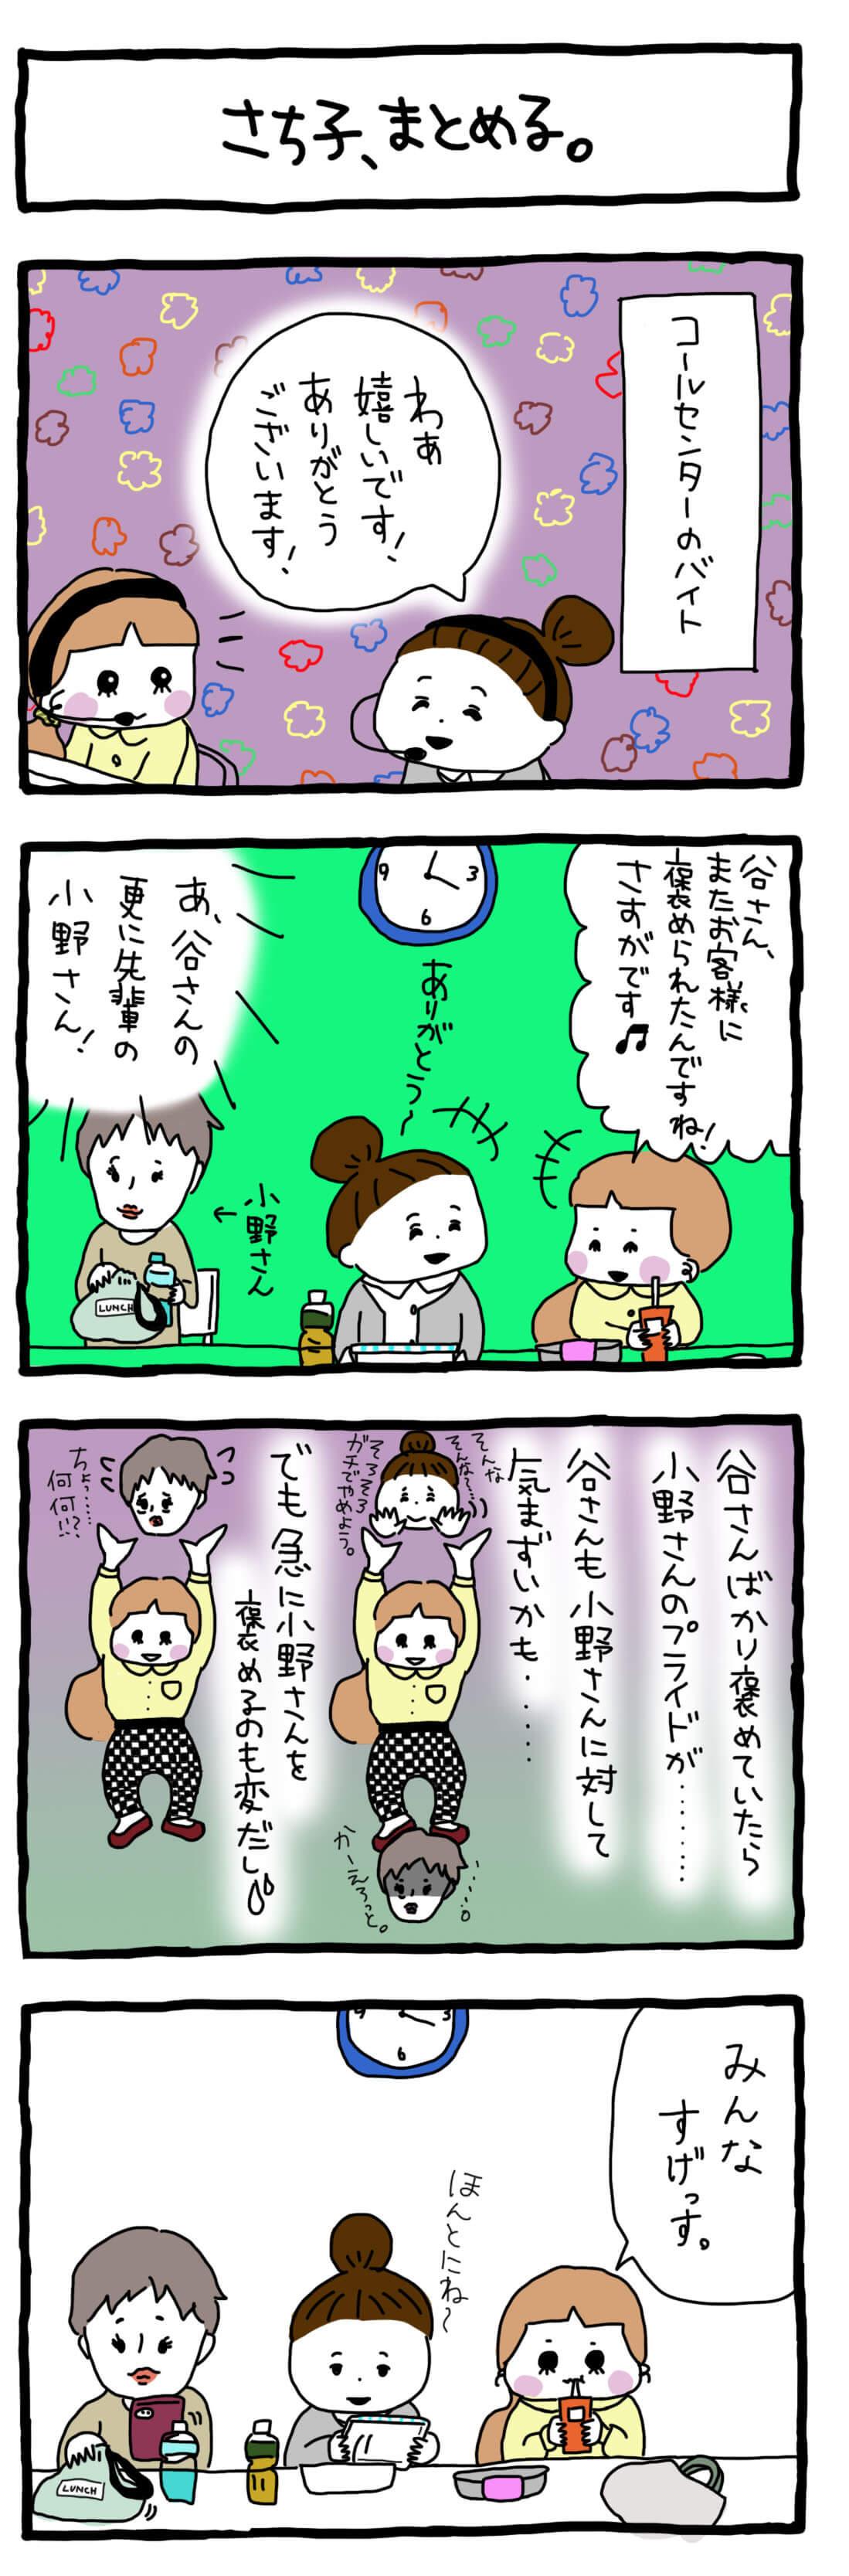 漫画家・武井怜_no.39